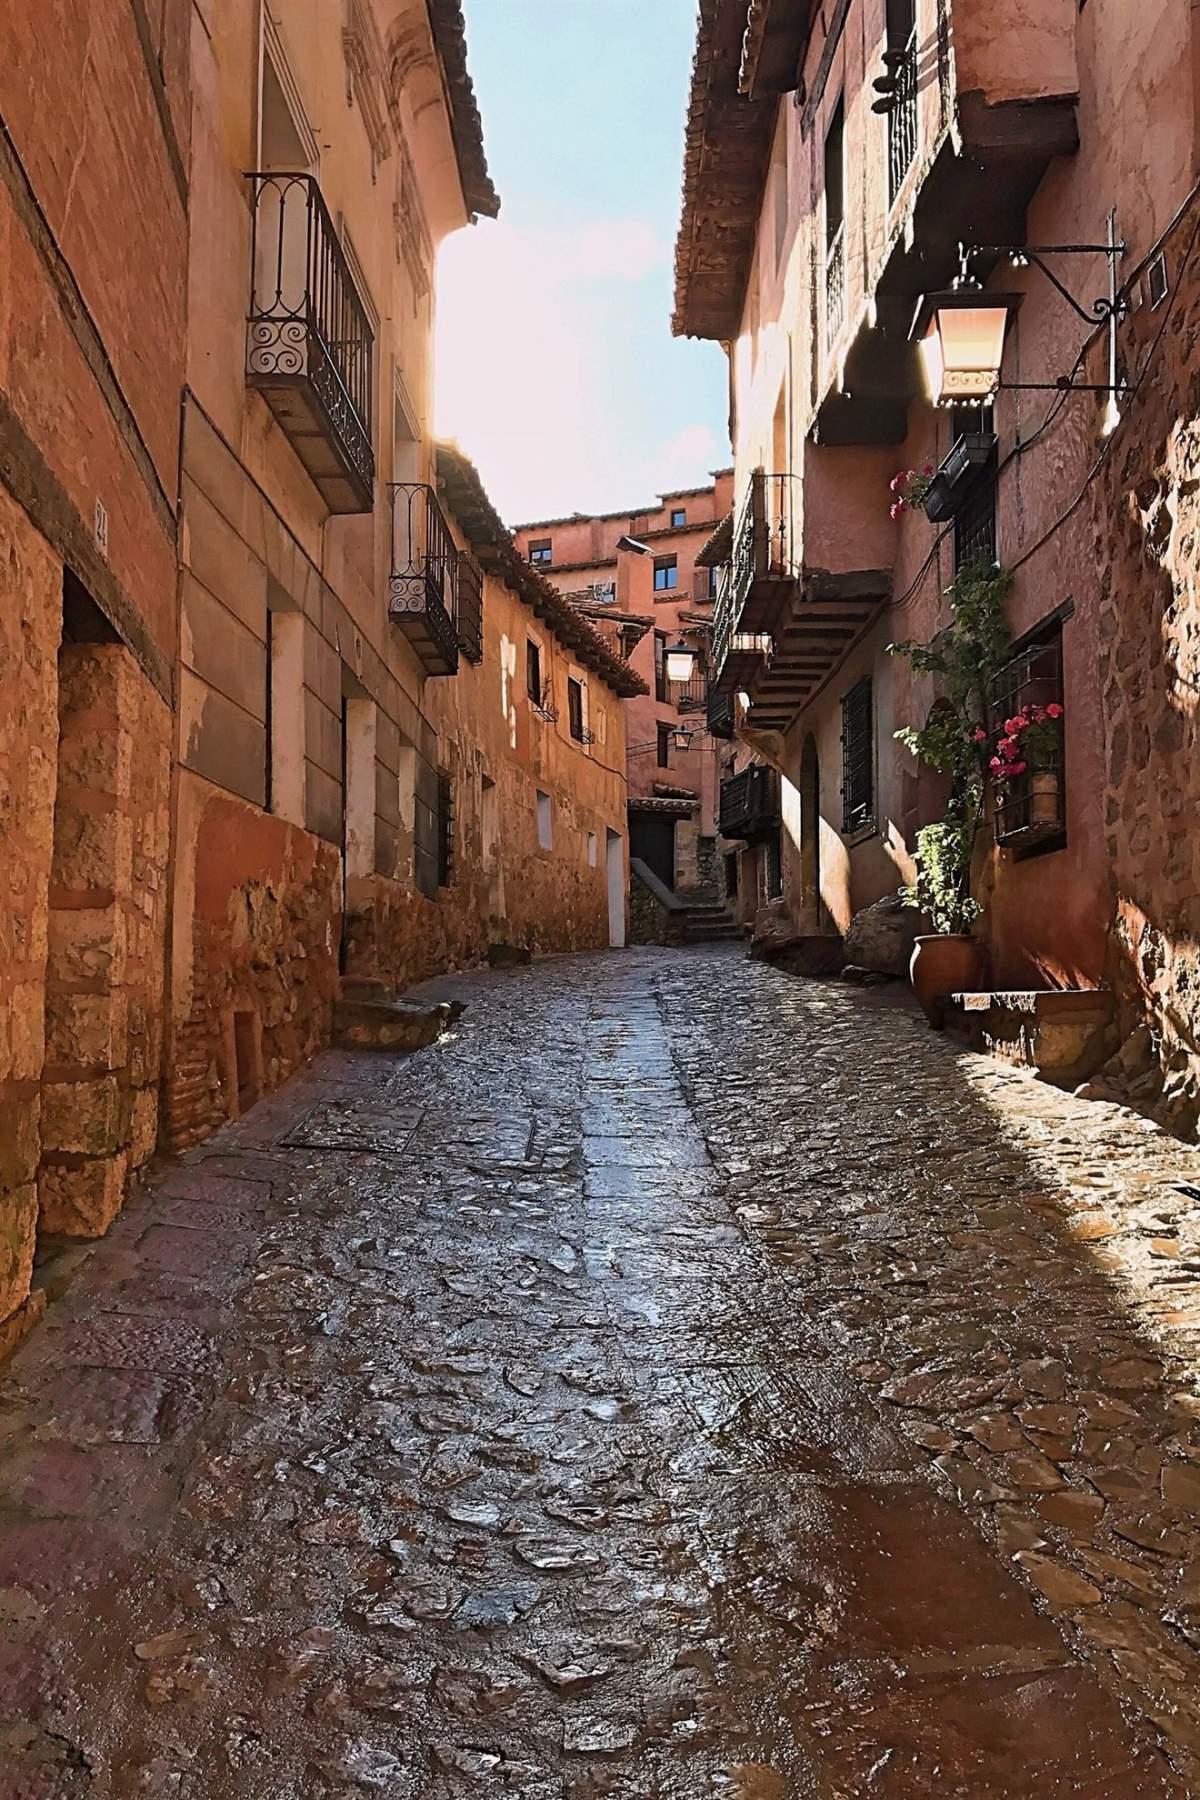 Albarracin μεσαιωνικό χωριό στην Ισπανία